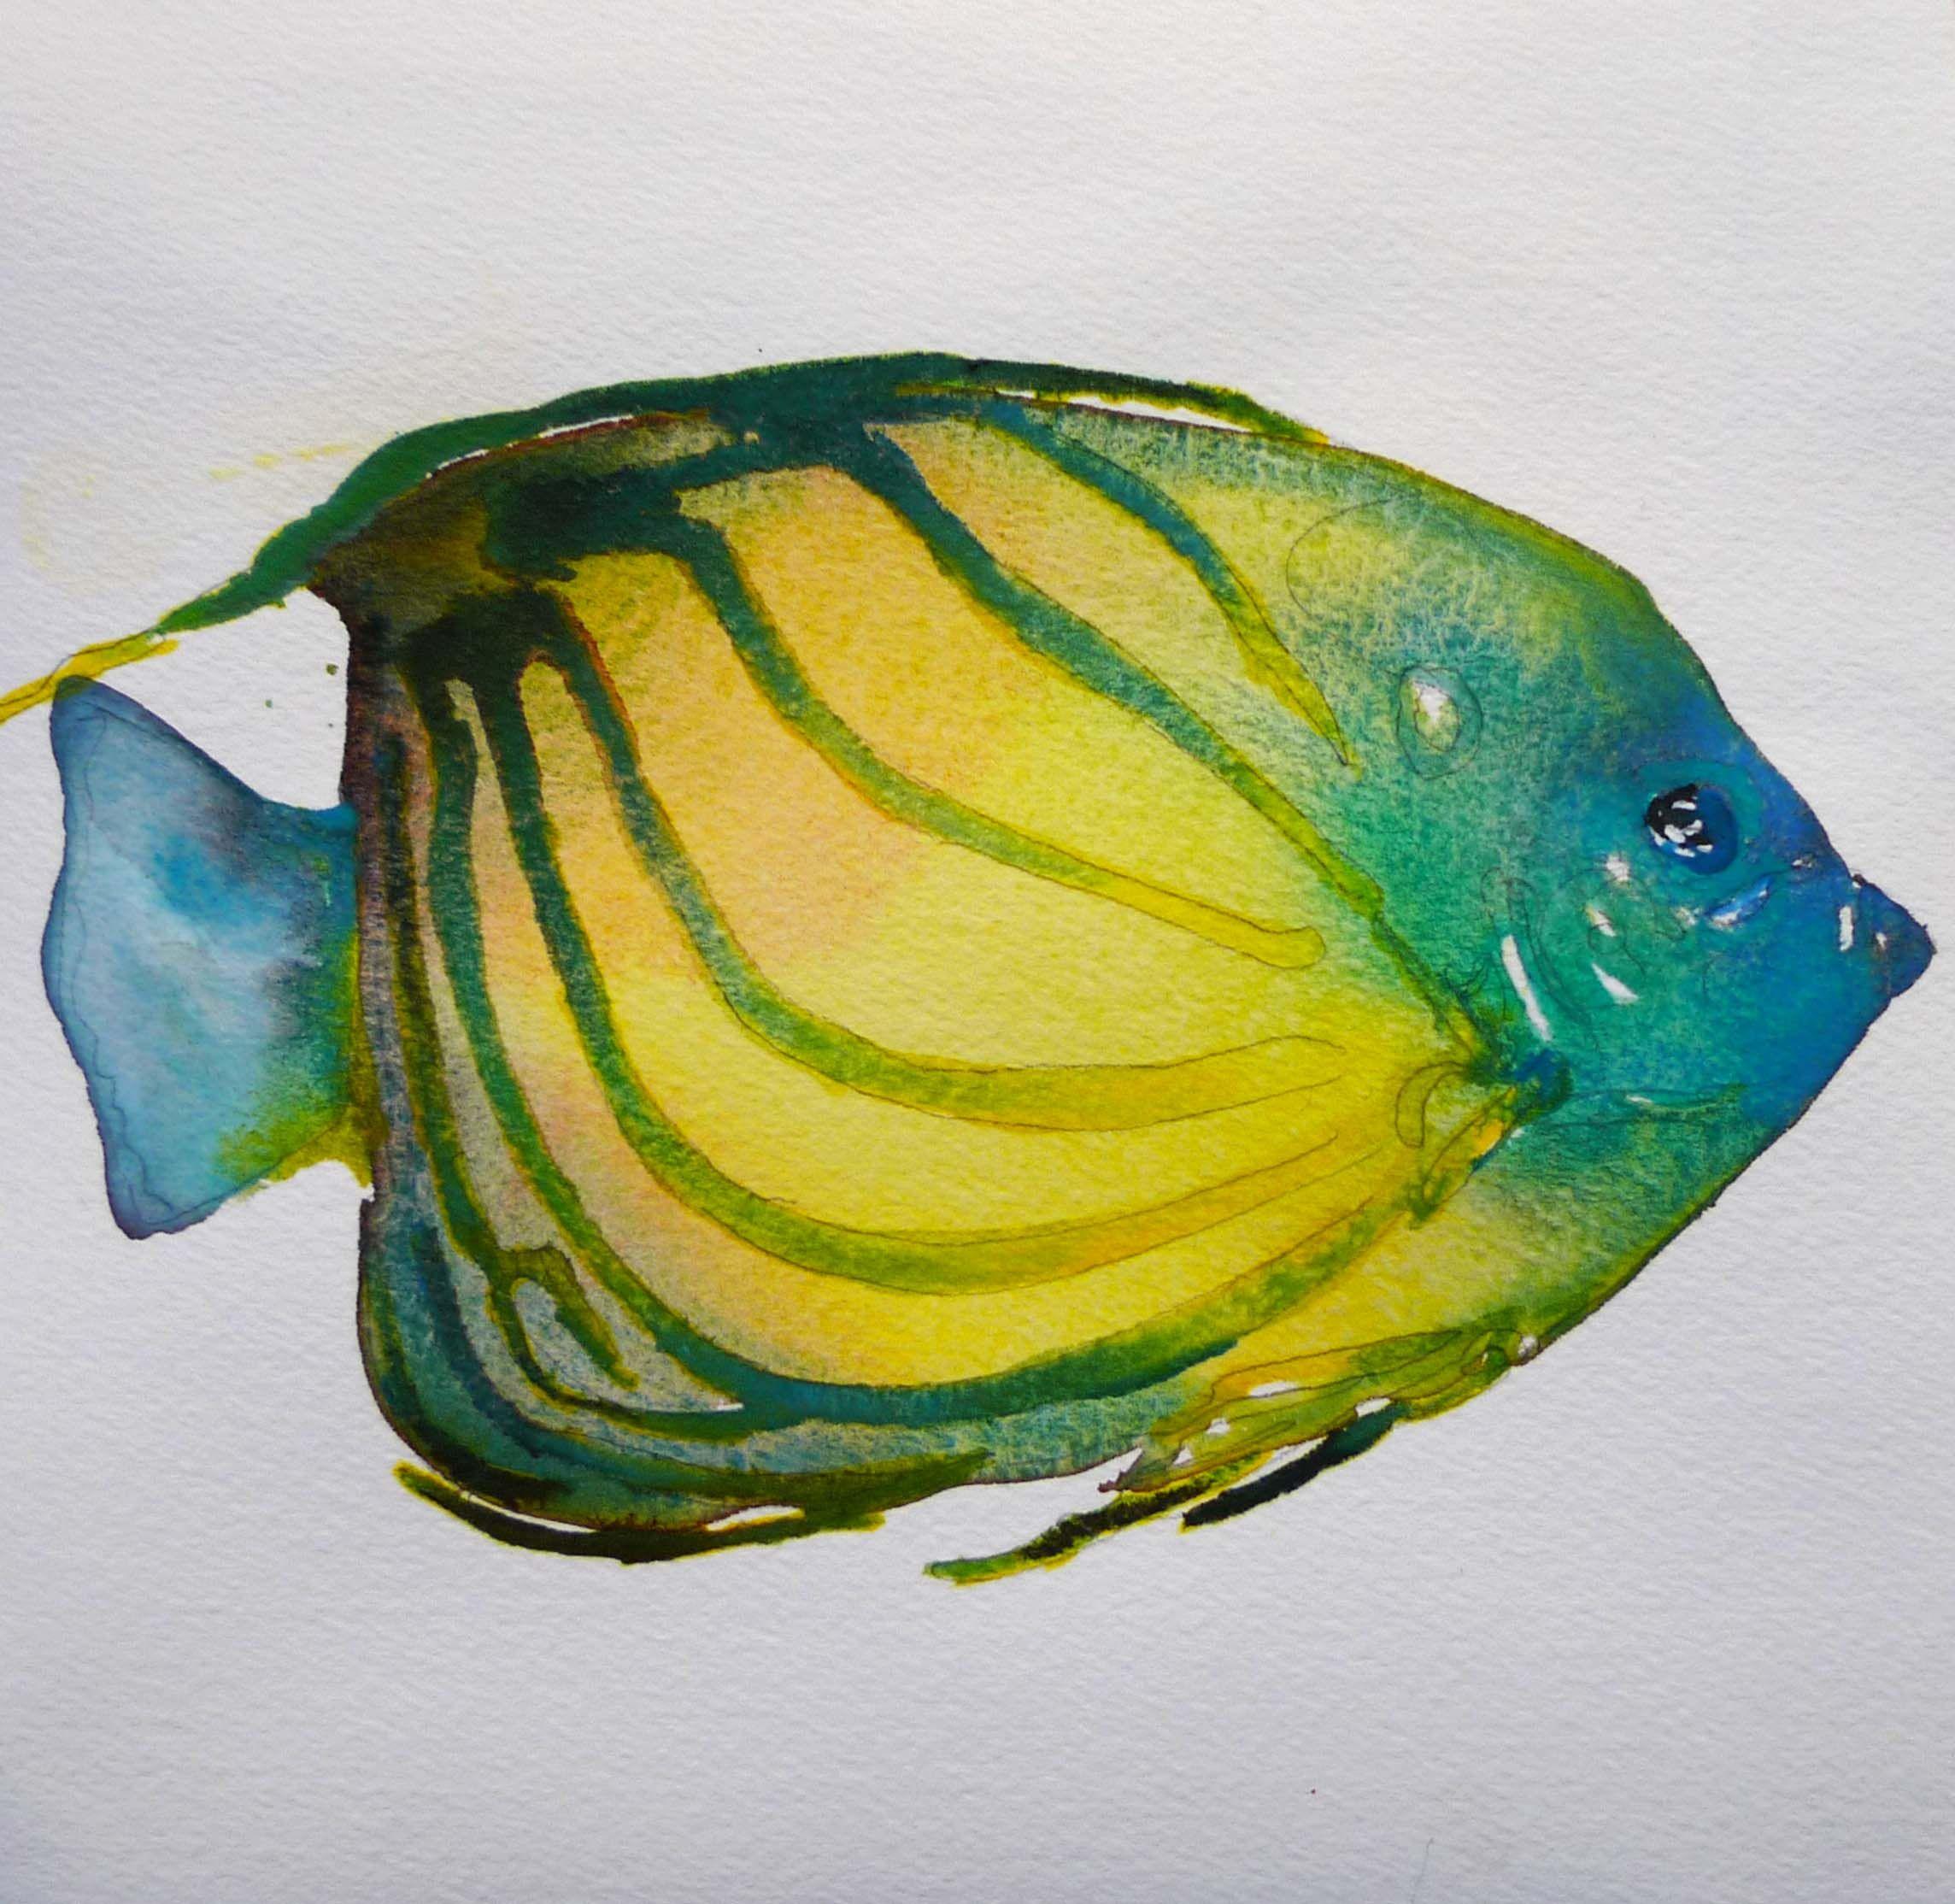 Tropical Fish Watercolor 7 5 X 7 5